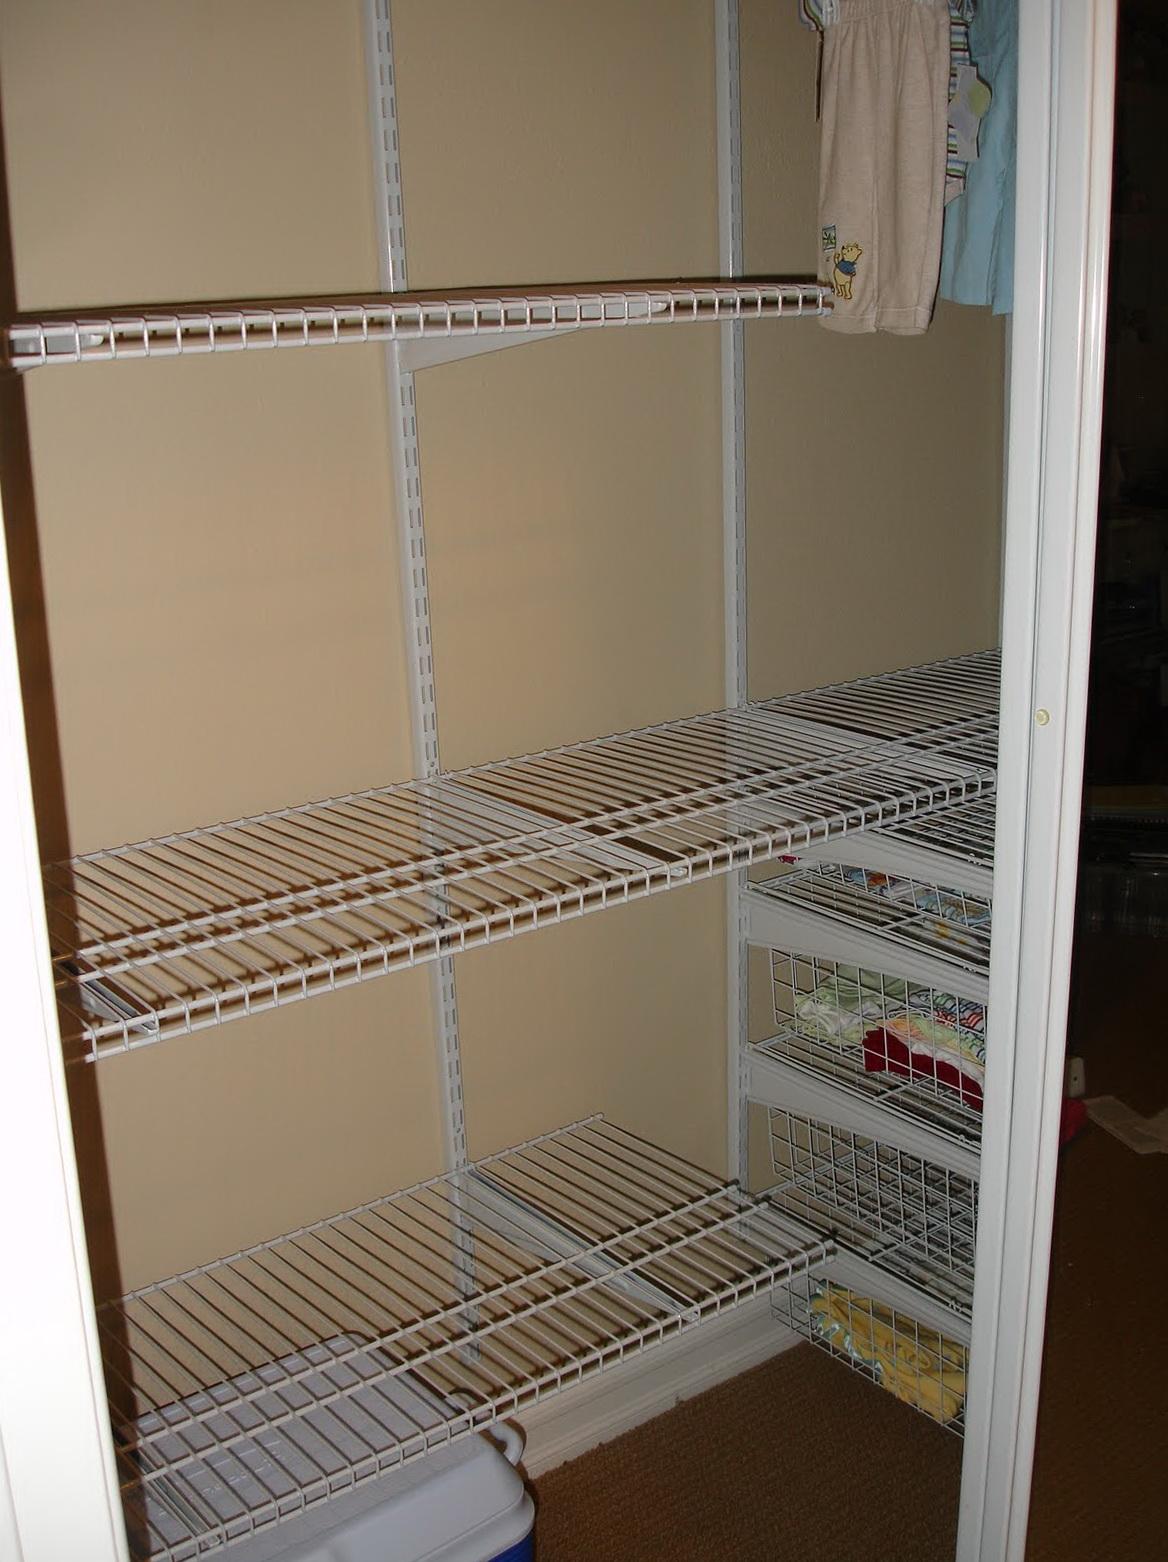 wire shelving units for closets   Home Design Ideas